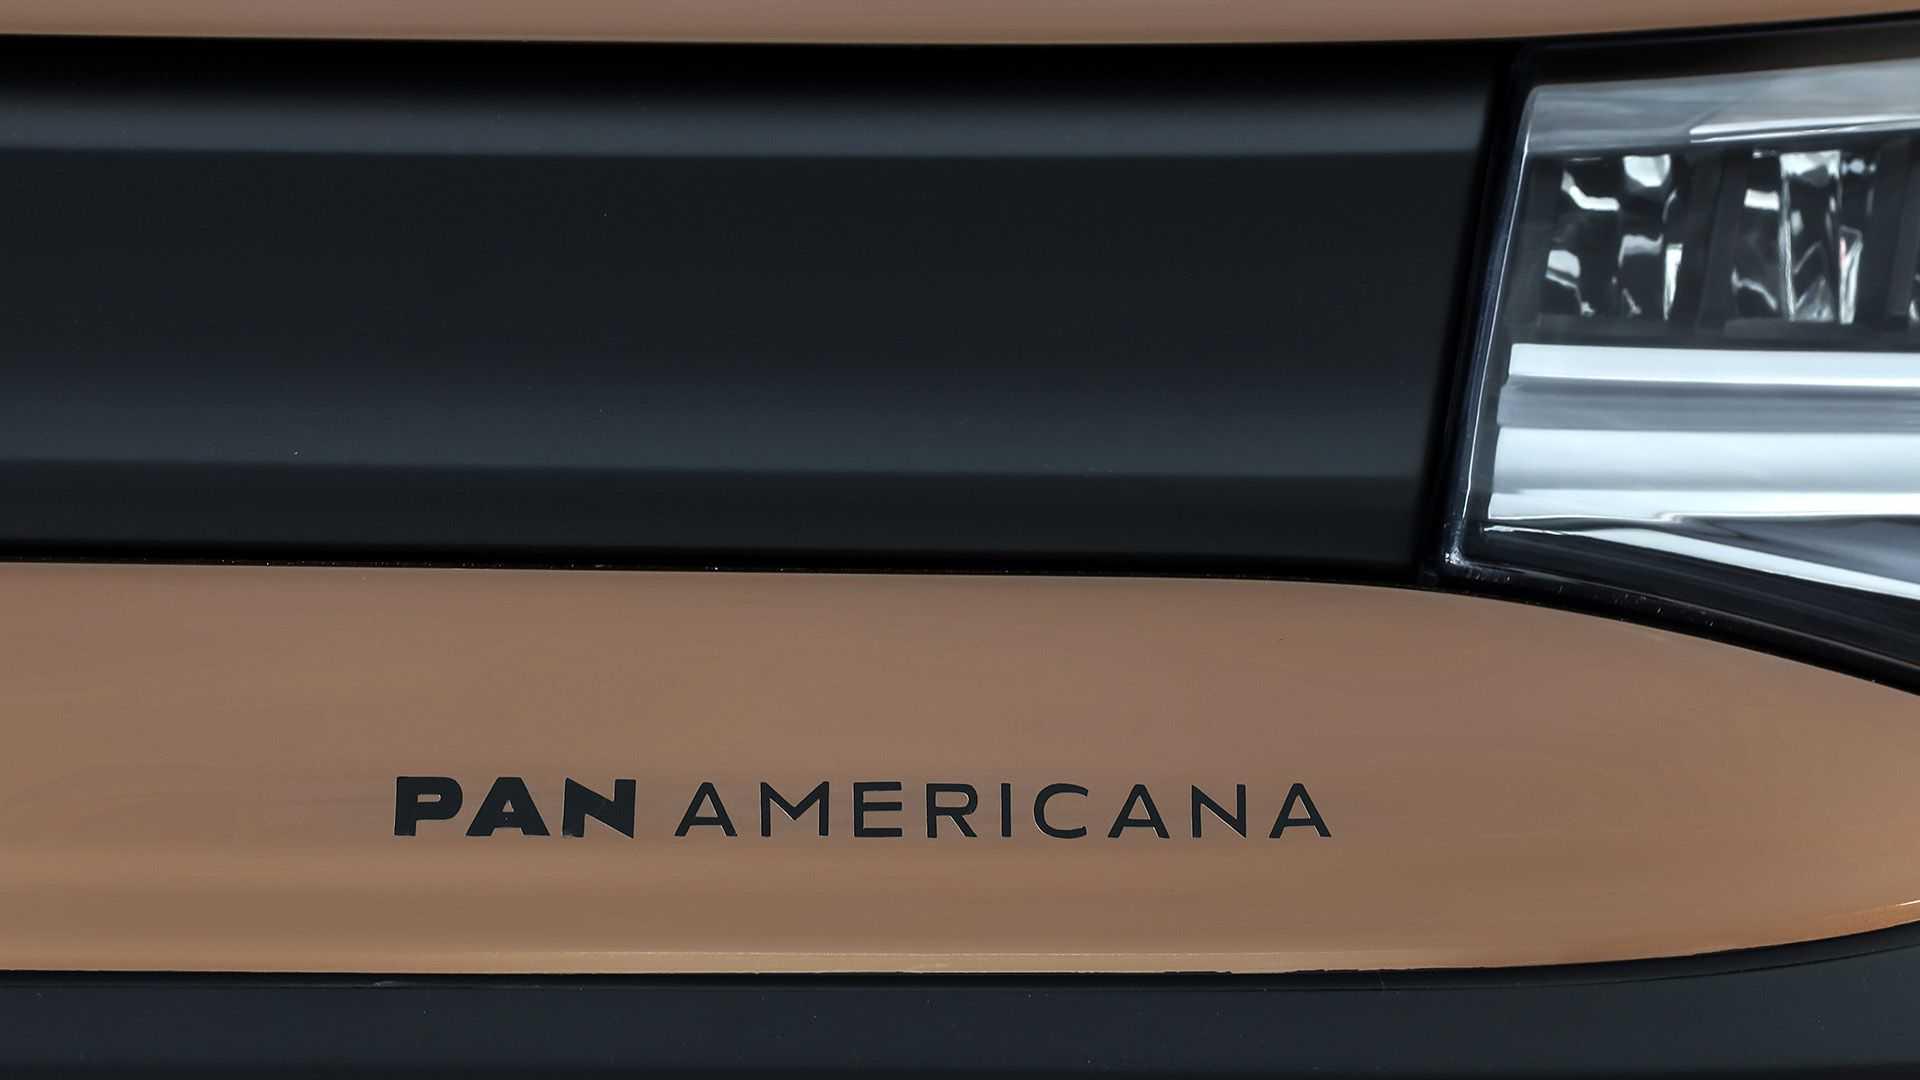 vw-caddy-panamericana-20216.jpeg